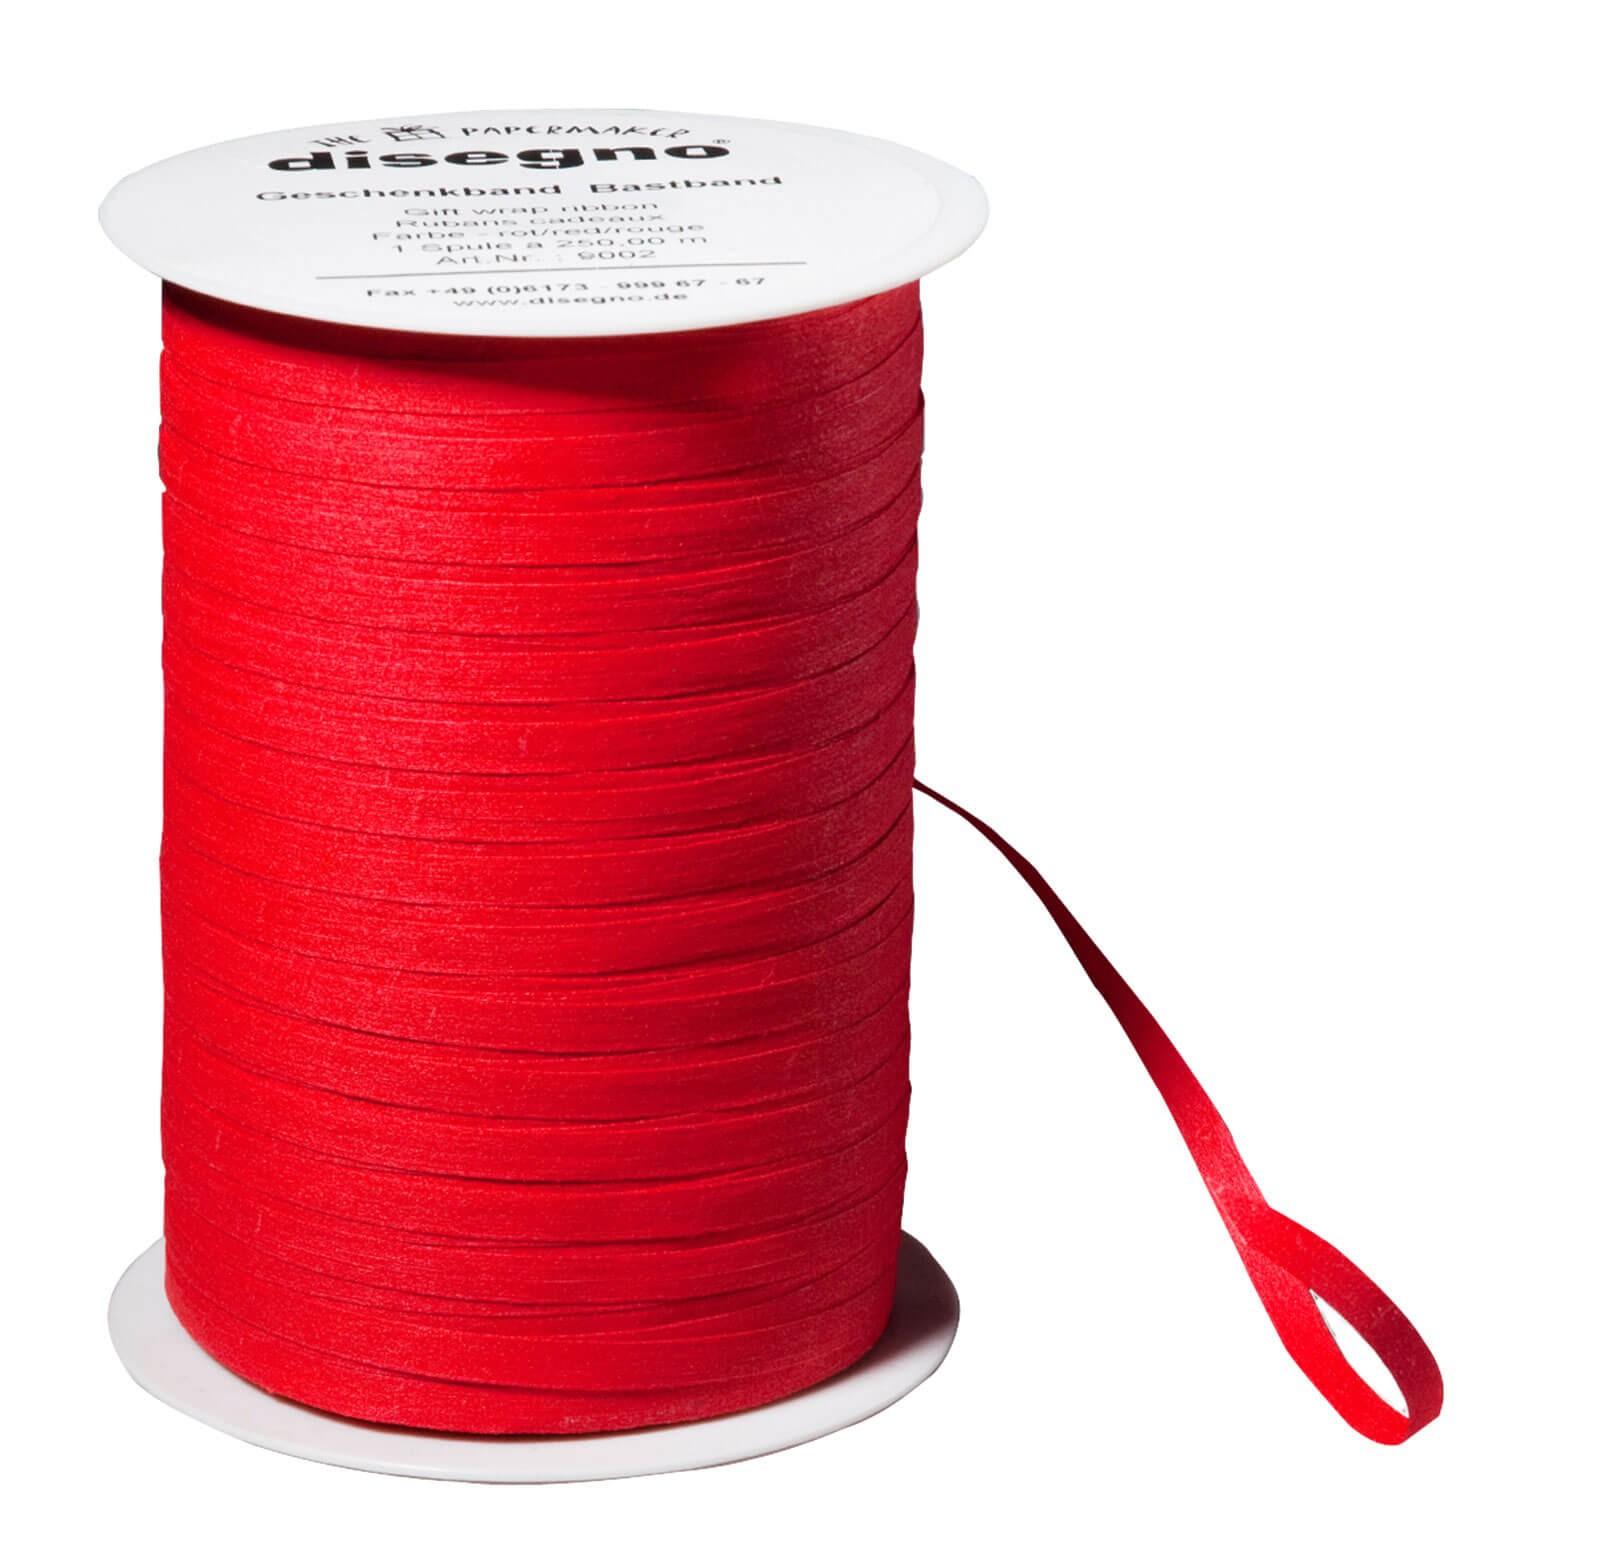 Ruban cadeau coton - rouge